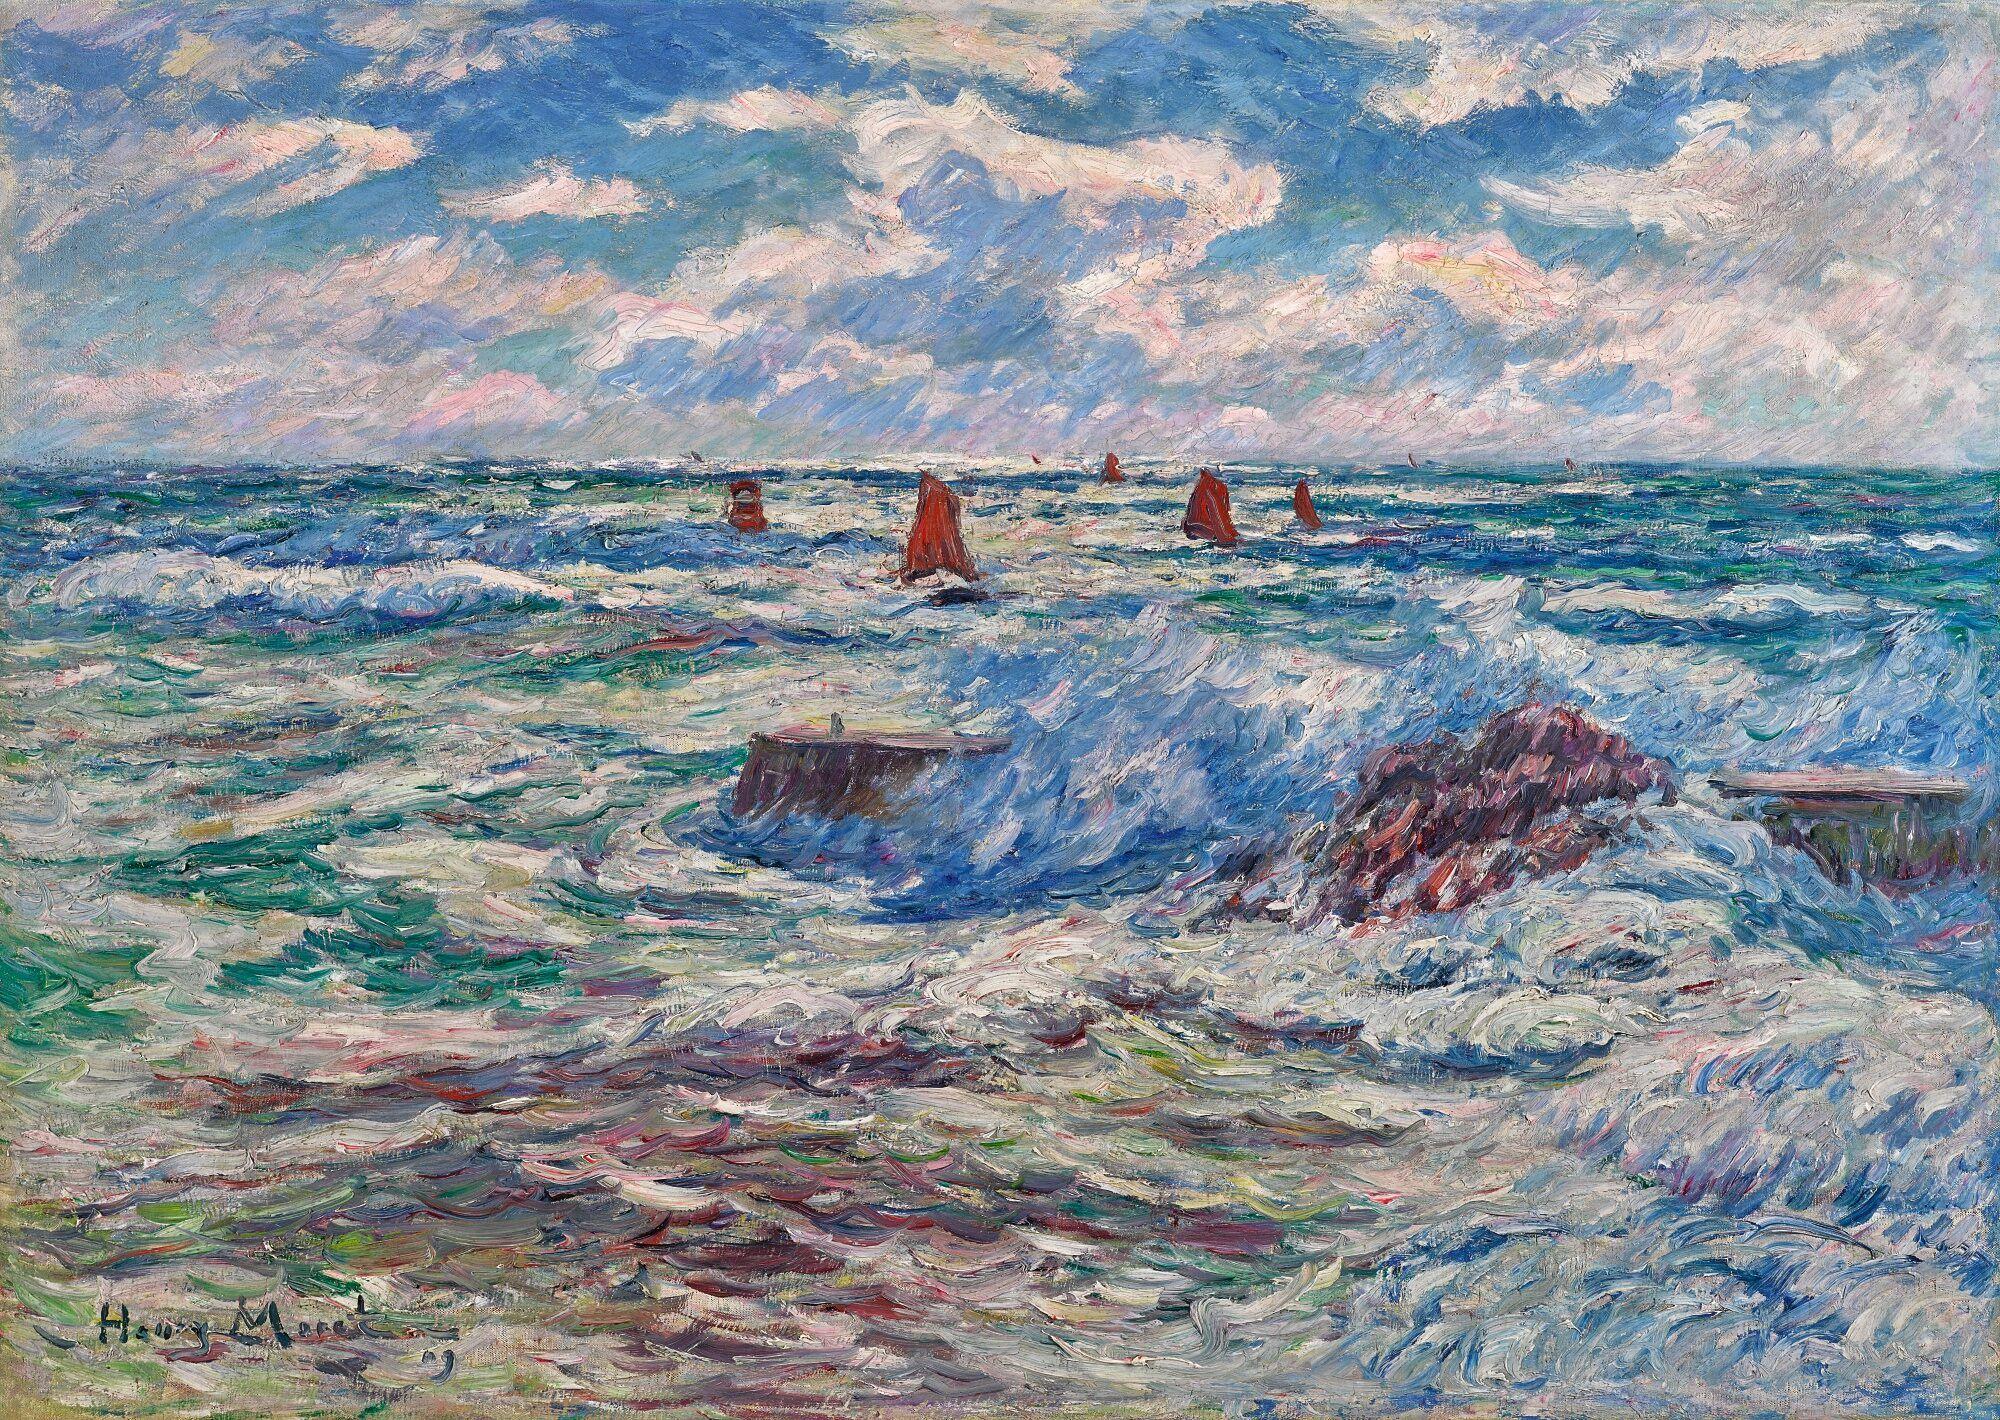 Gros Oeuvre Quimper henry moret - 1856 - 1913 - gros temps À doËlan, bretagne